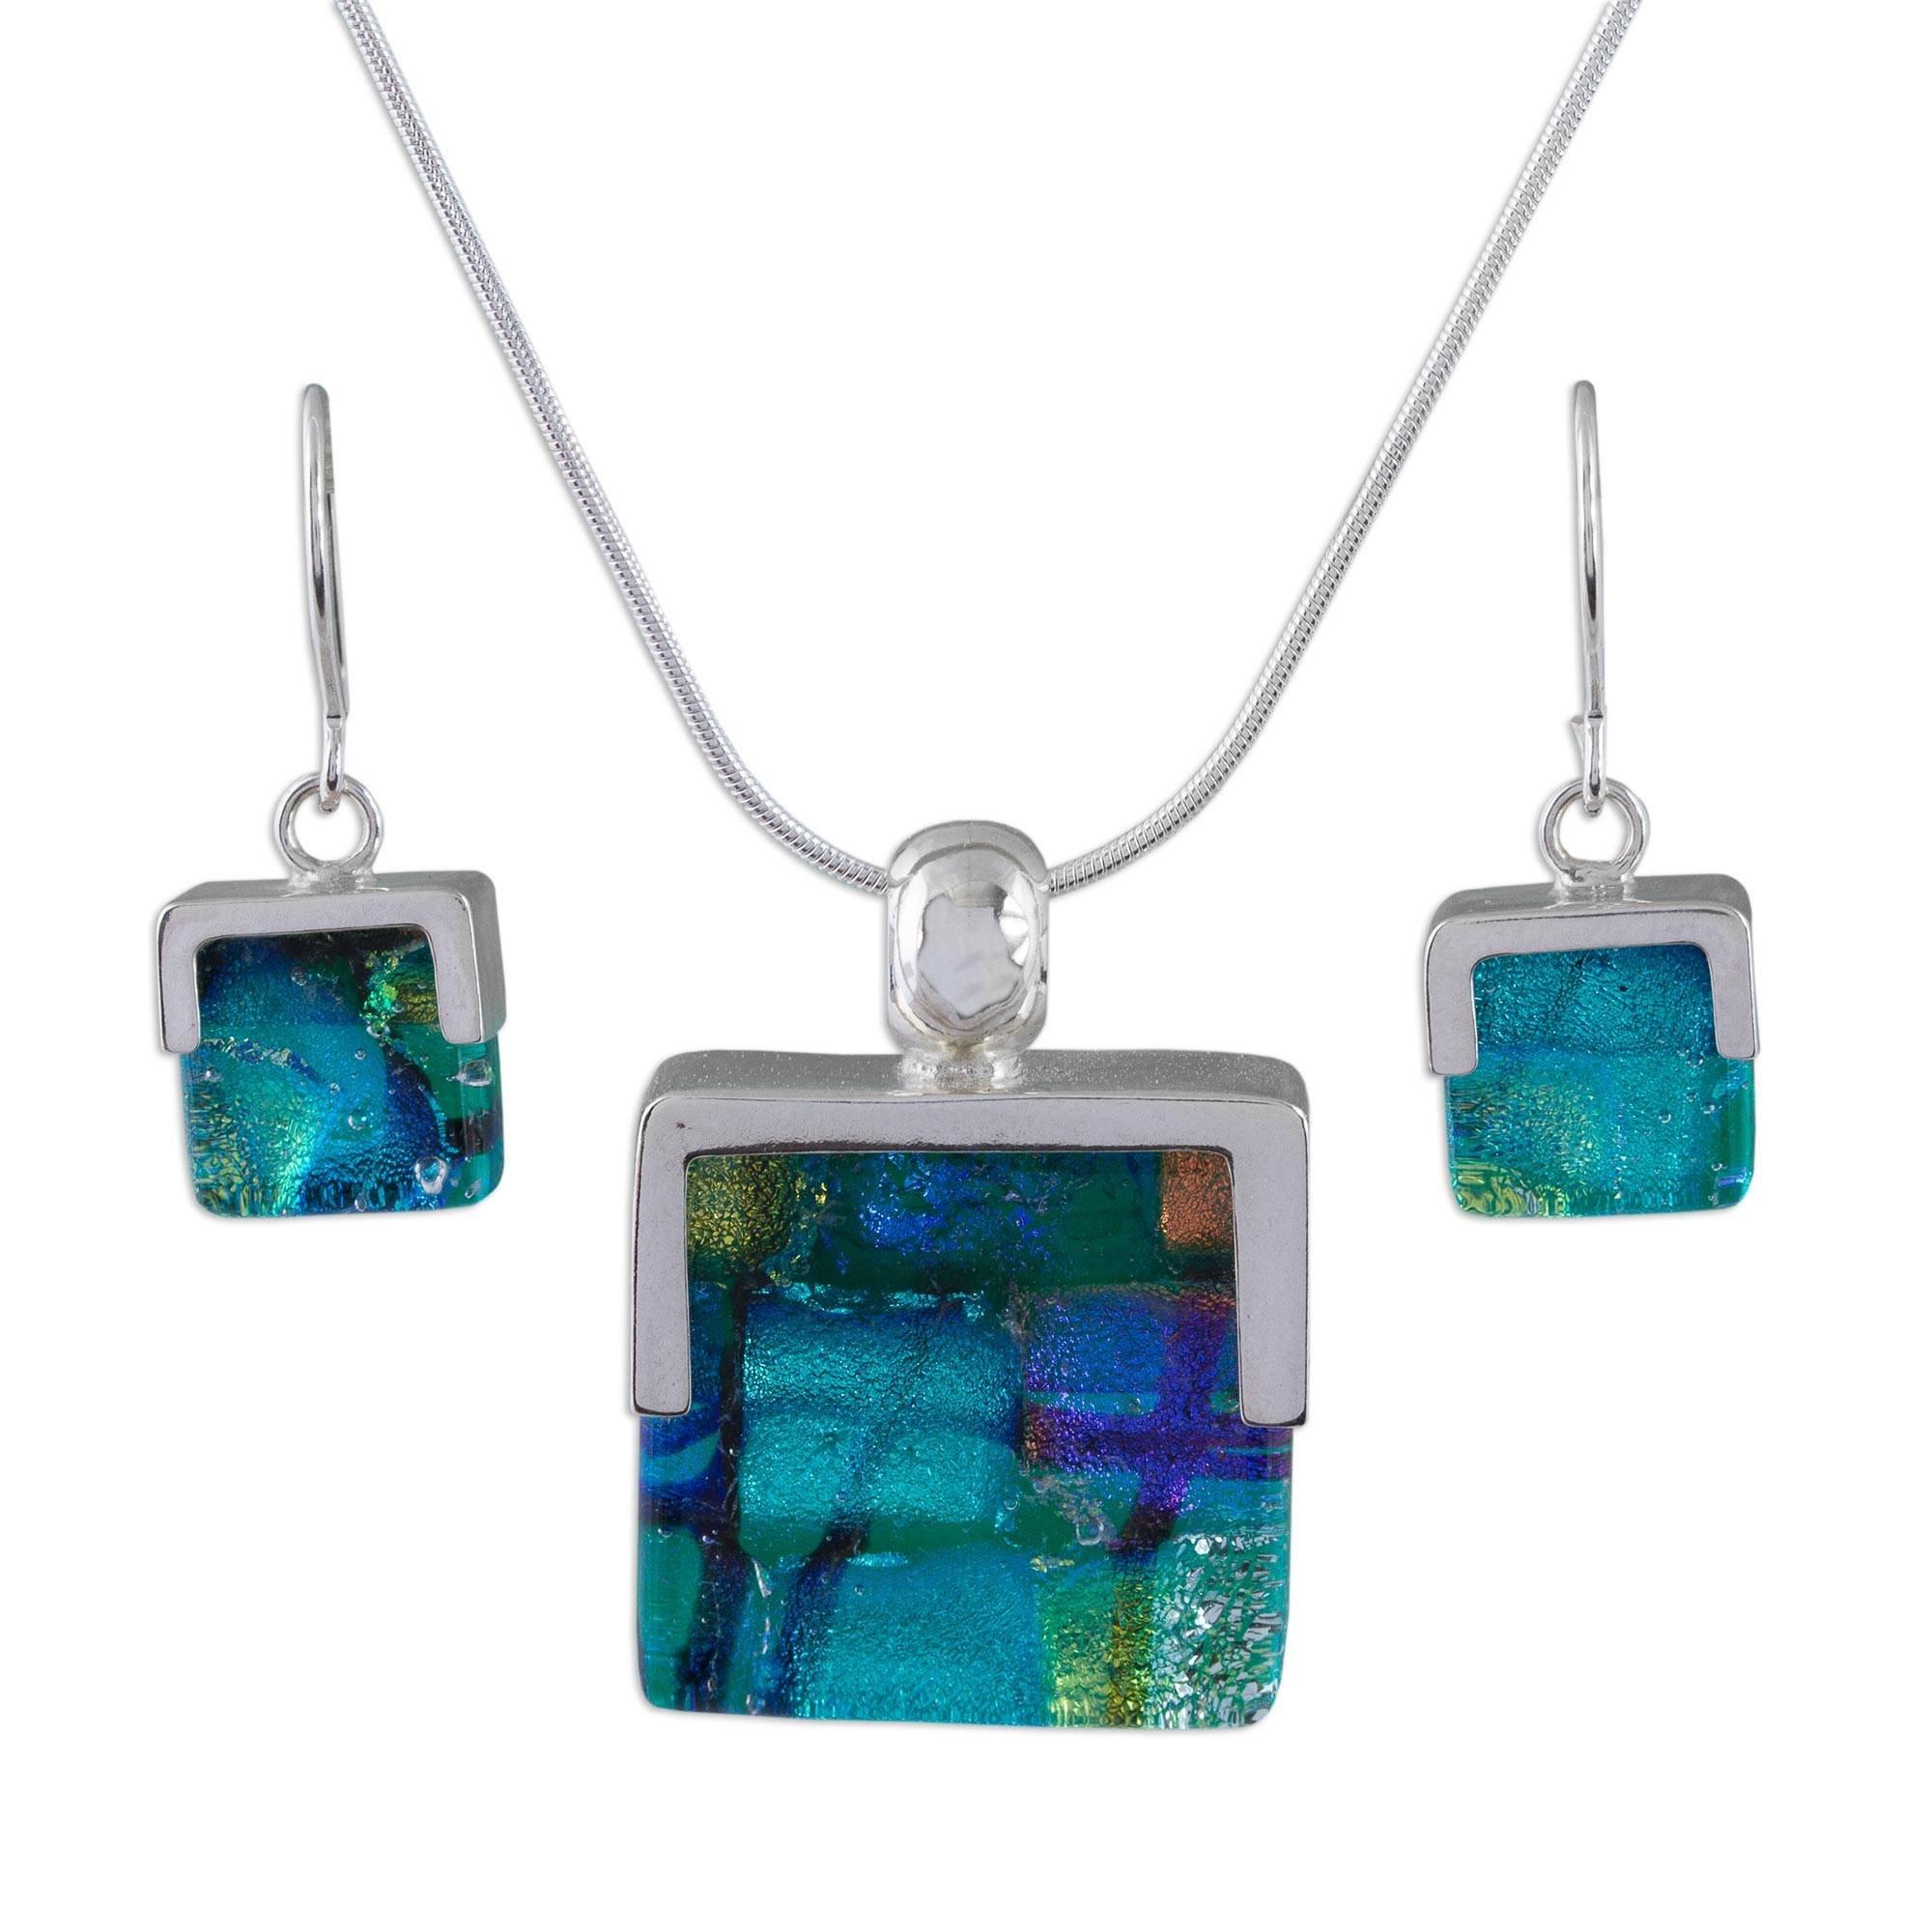 NOVICA .925 Sterling Silver Glass Jewelry Set 'Luminous'